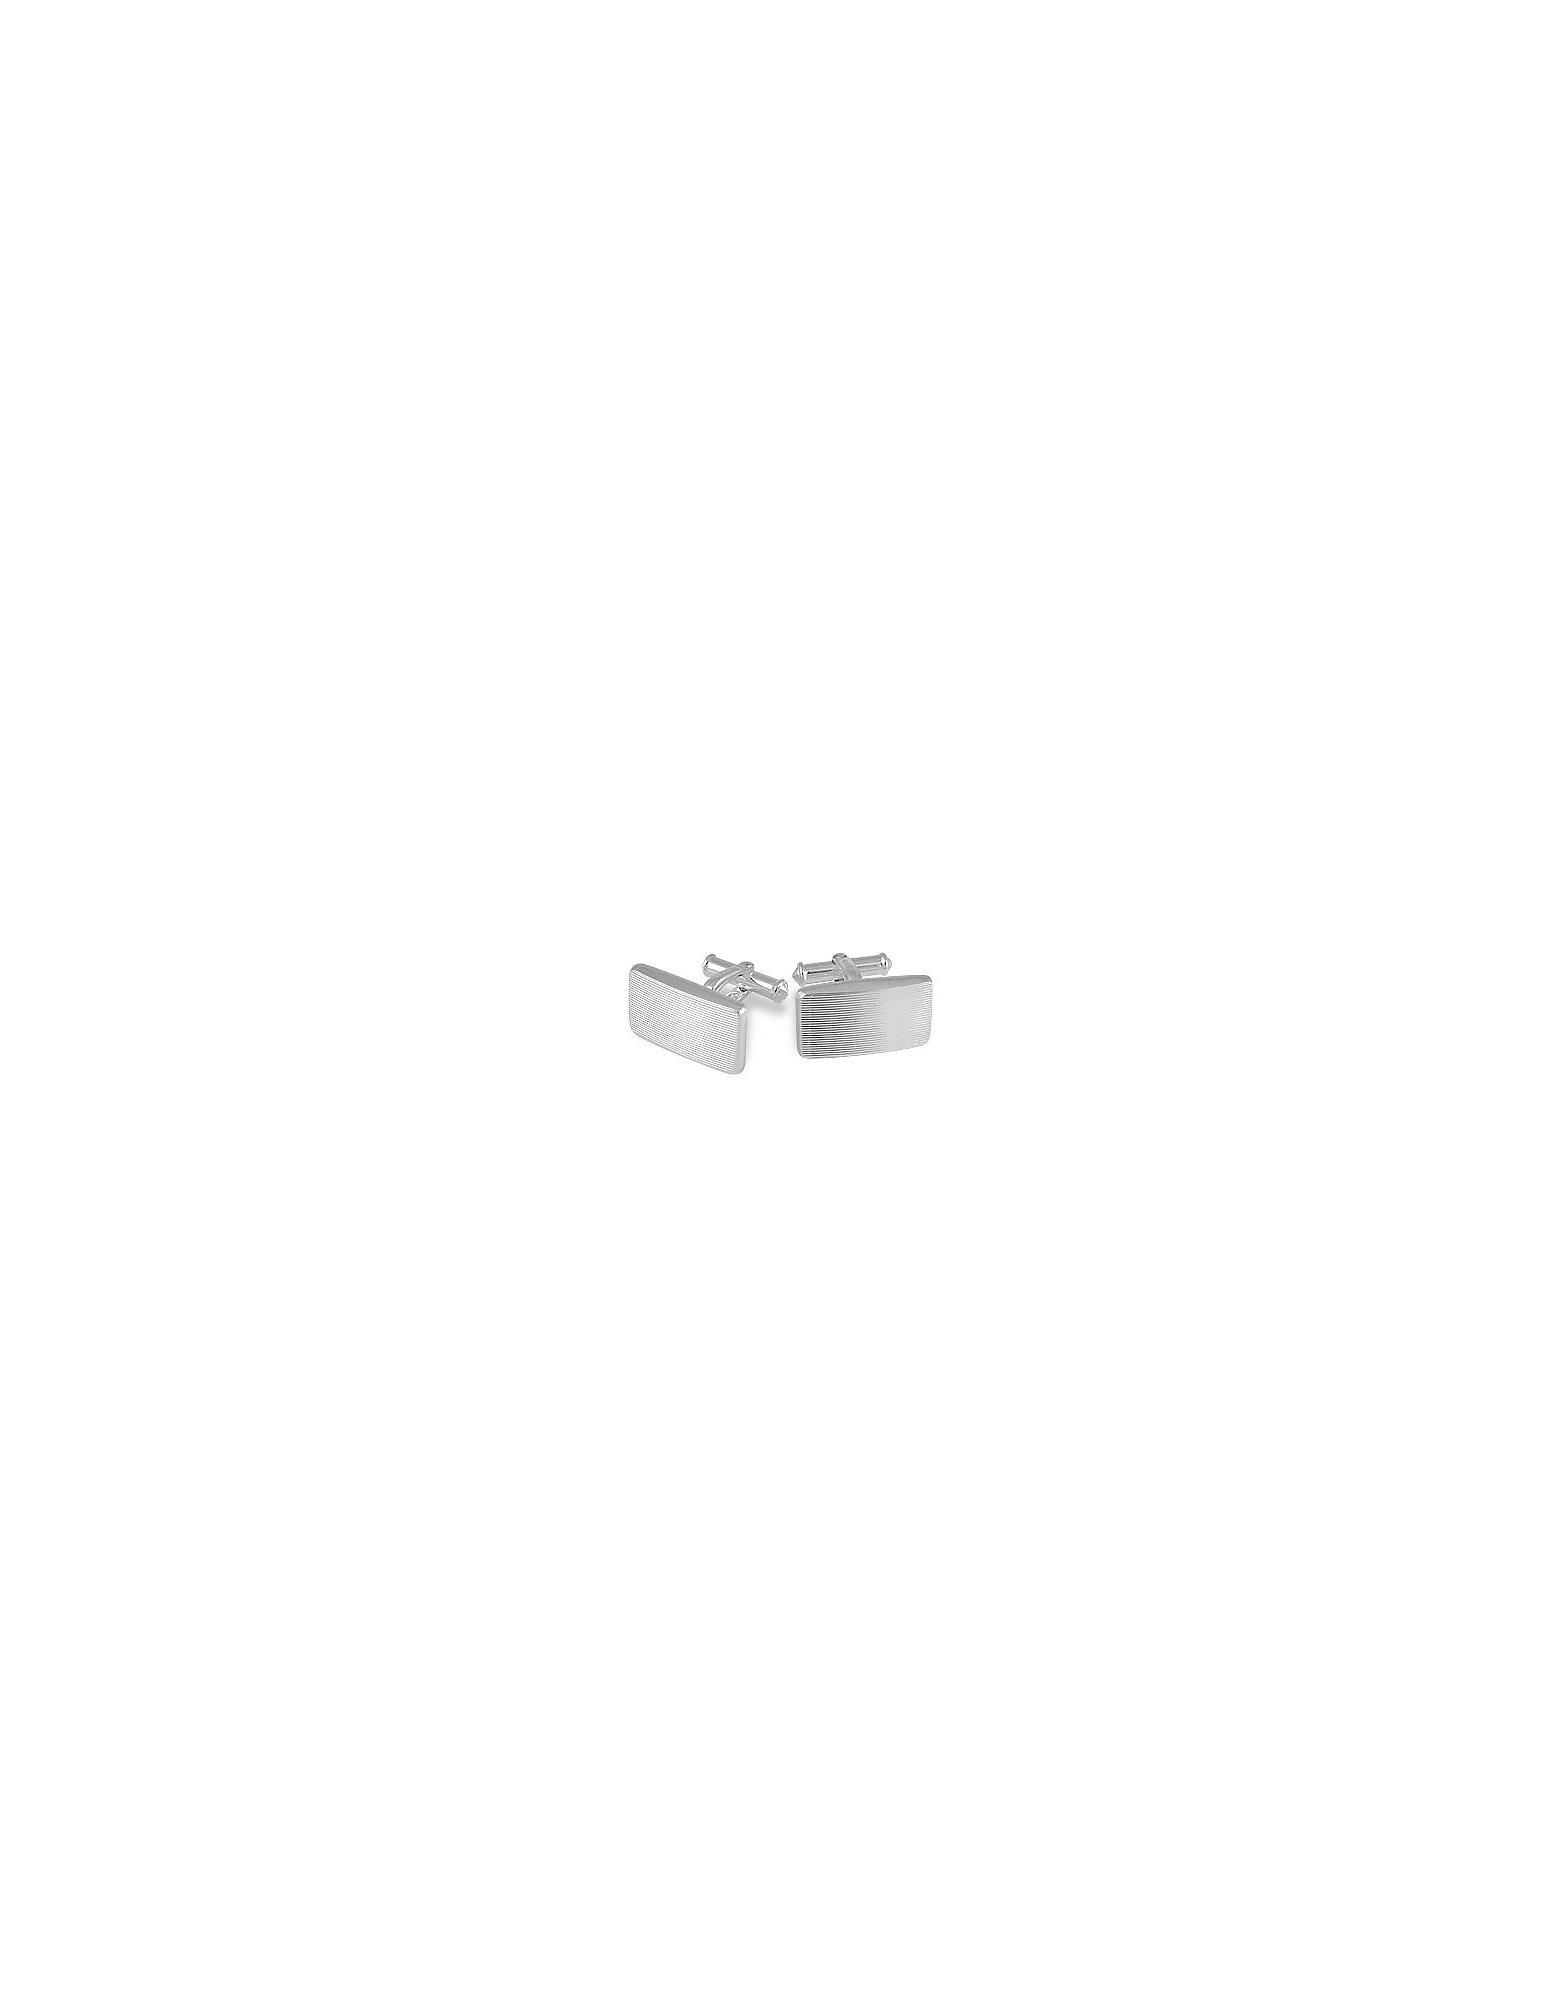 Forzieri Cufflinks, Dandy - Sterling Silver Carved Cufflinks